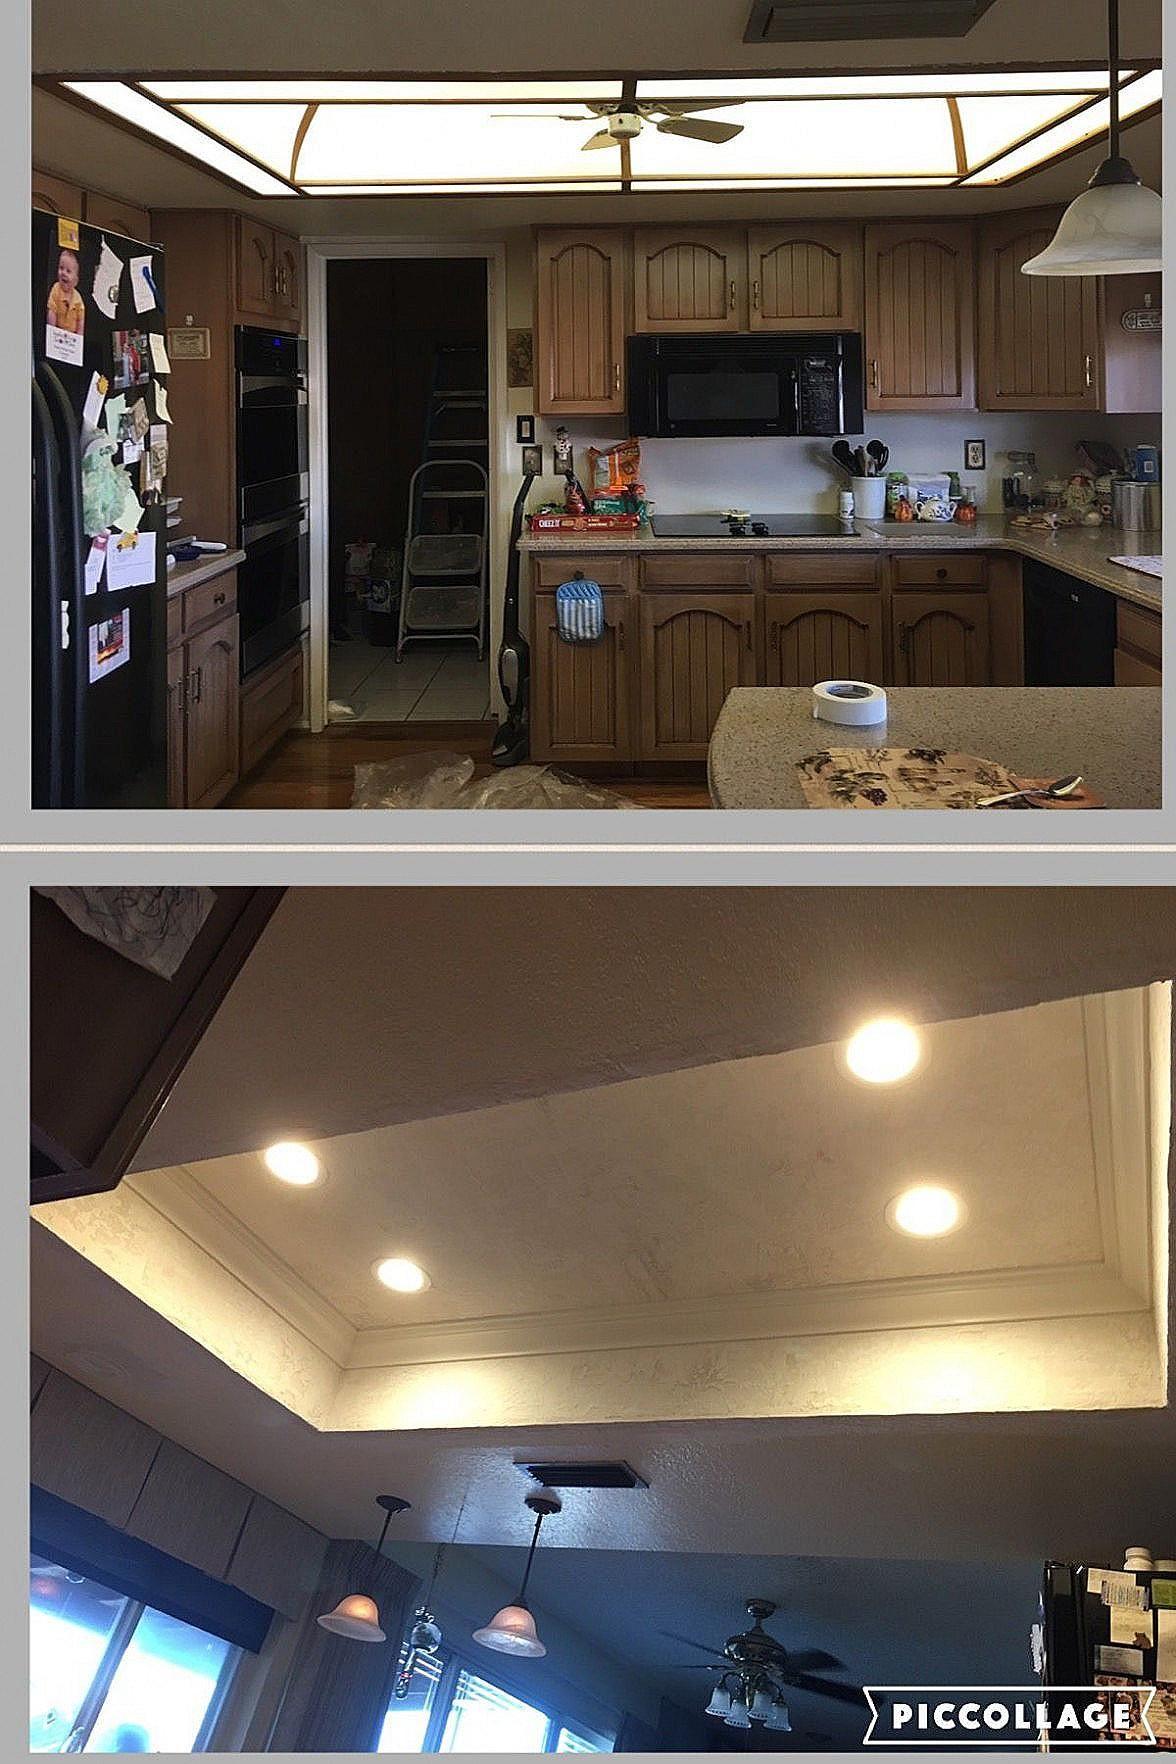 Unique Recessed Lighting Under Kitchen Cabinets Recessed Lighting Kitchen Recessed Lighting Led Recessed Lighting